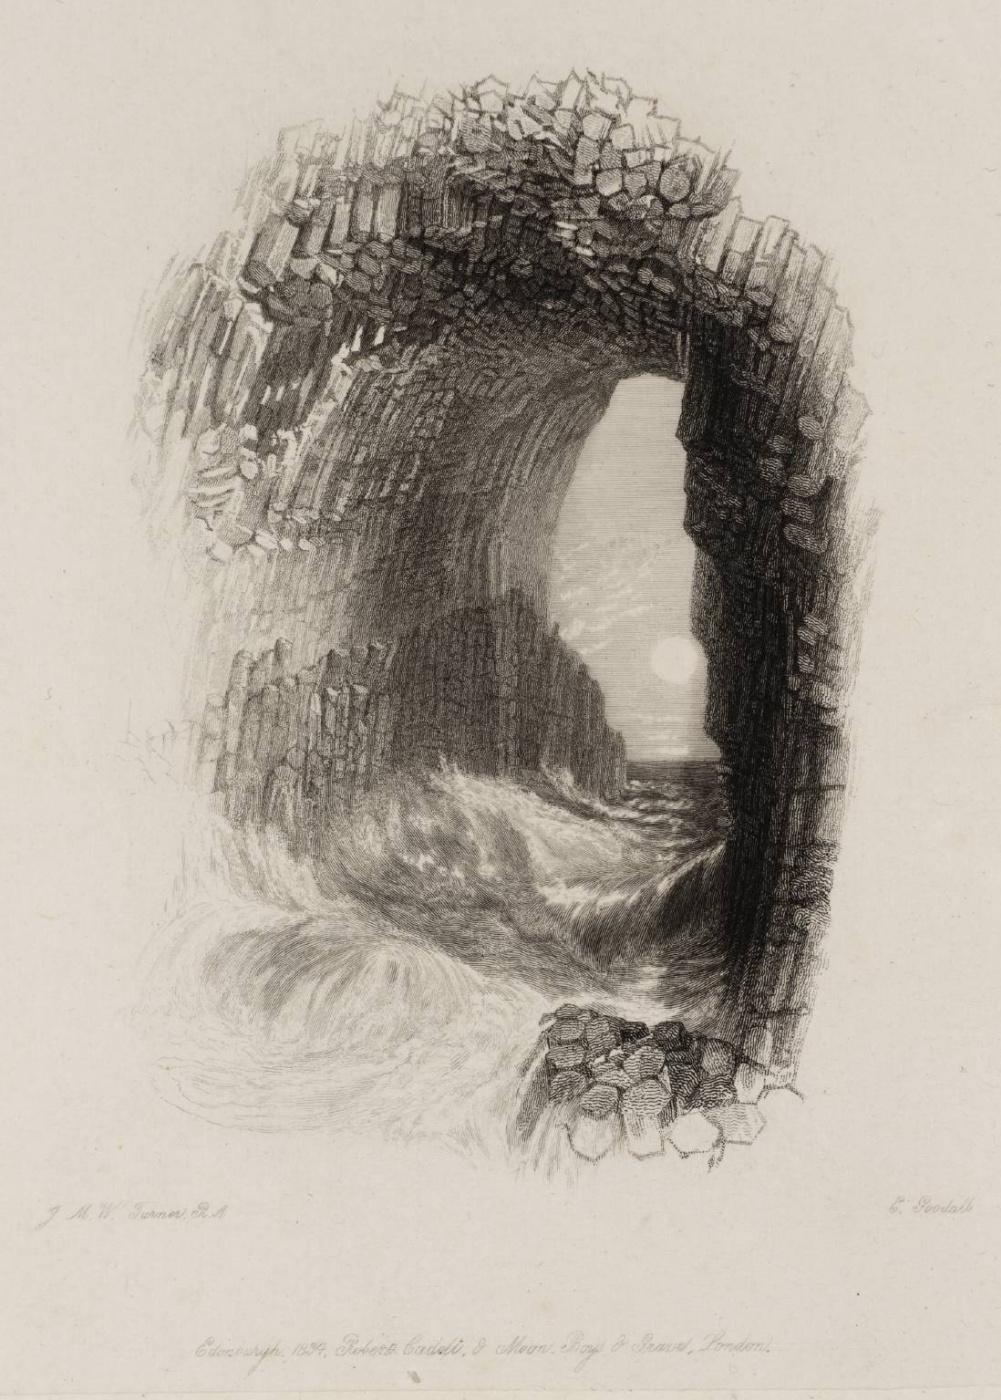 Joseph Mallord William Turner. Fingarova cave, Staffa